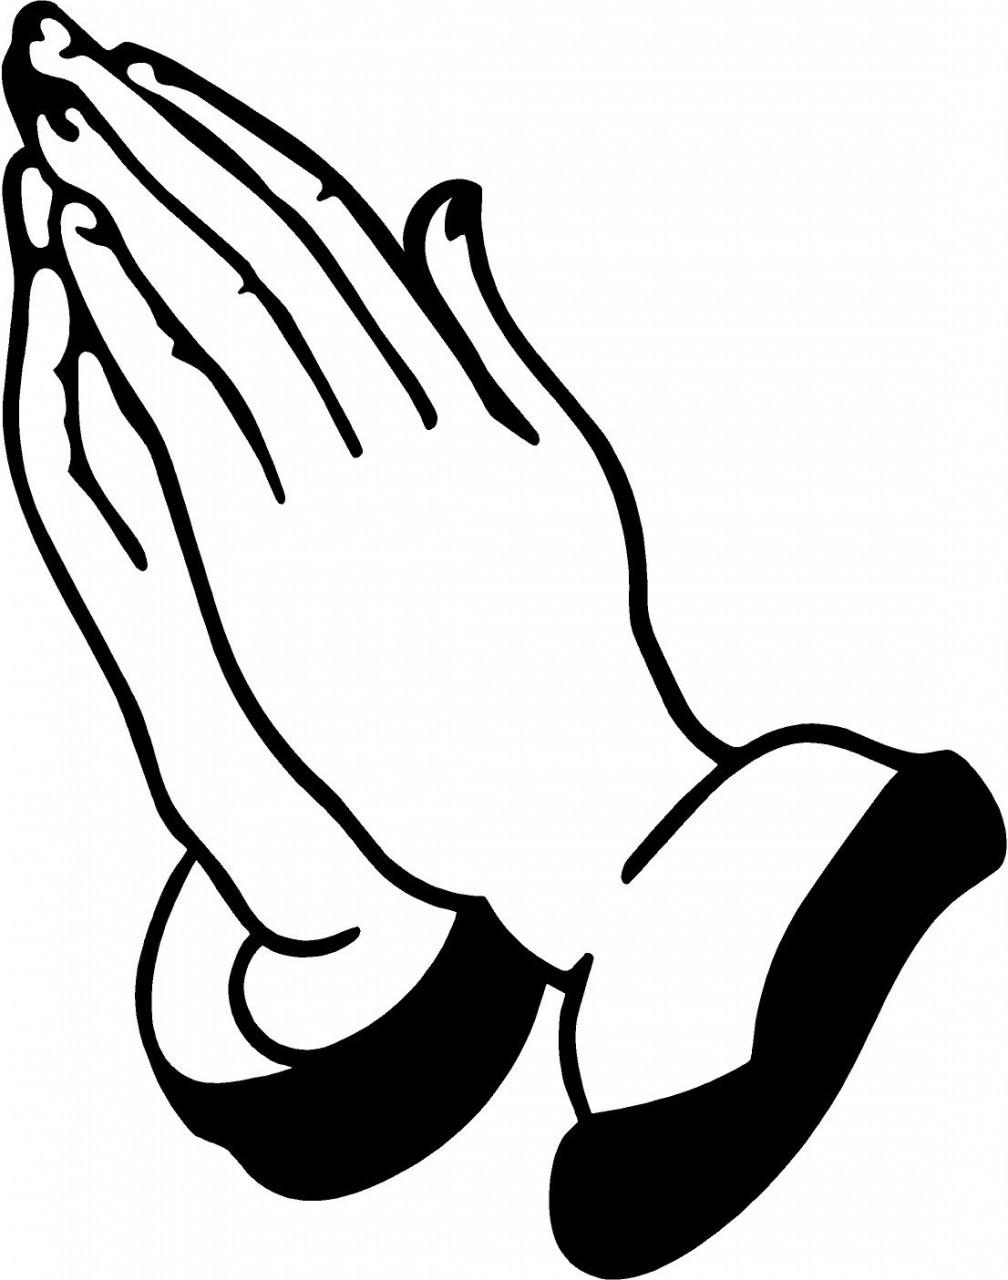 Prayer Hands Clipart Clipart .-Prayer Hands Clipart Clipart .-6